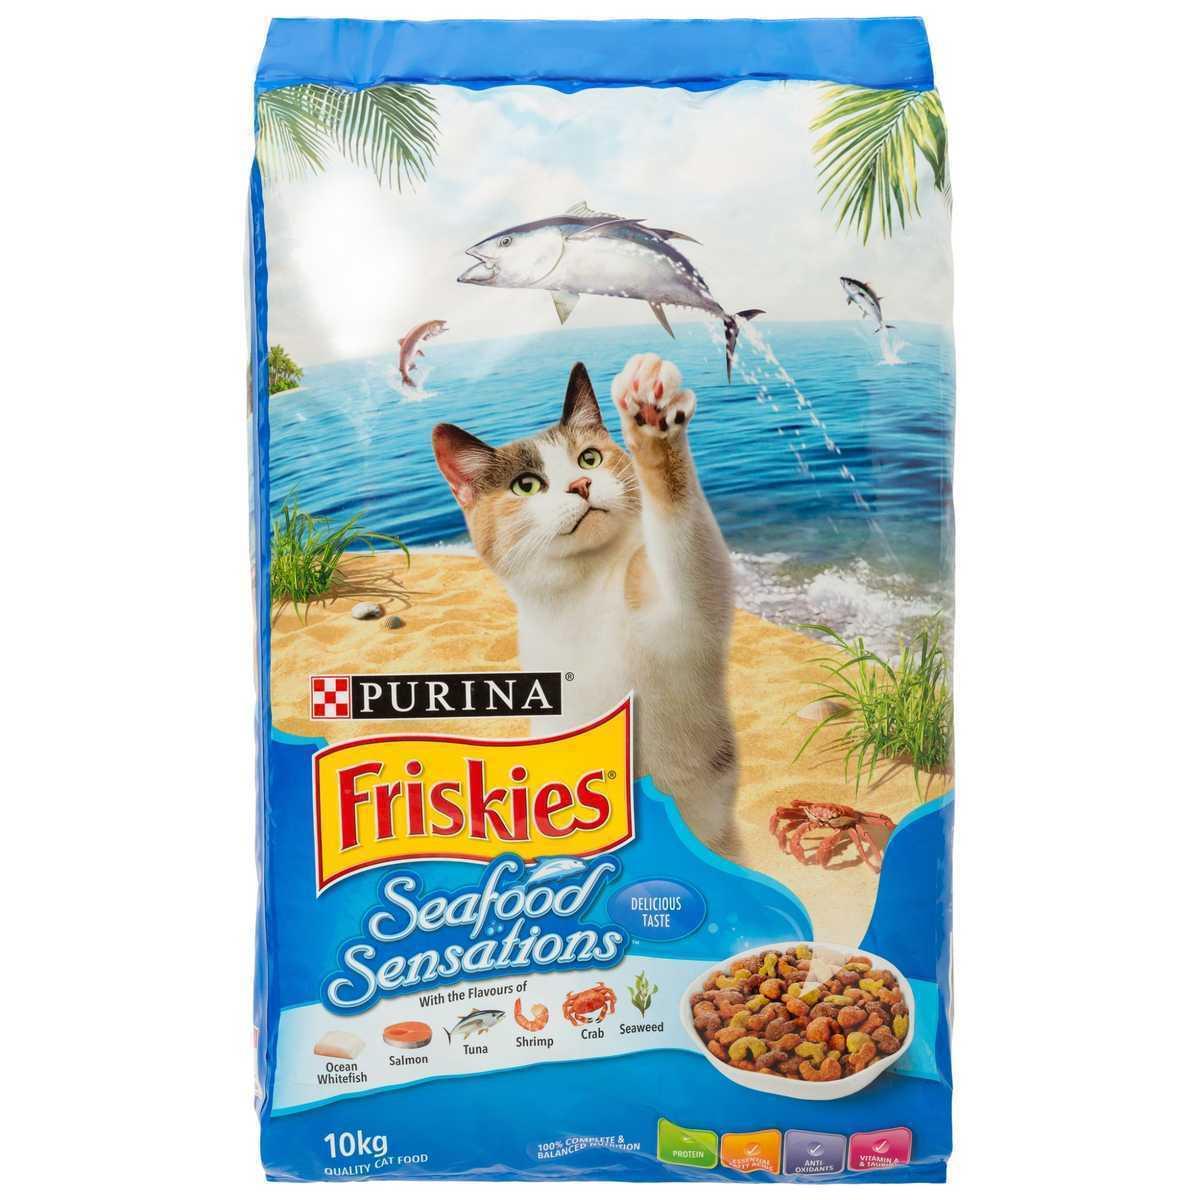 Friskies Seafood Sensations Cat Dry Food 10kg